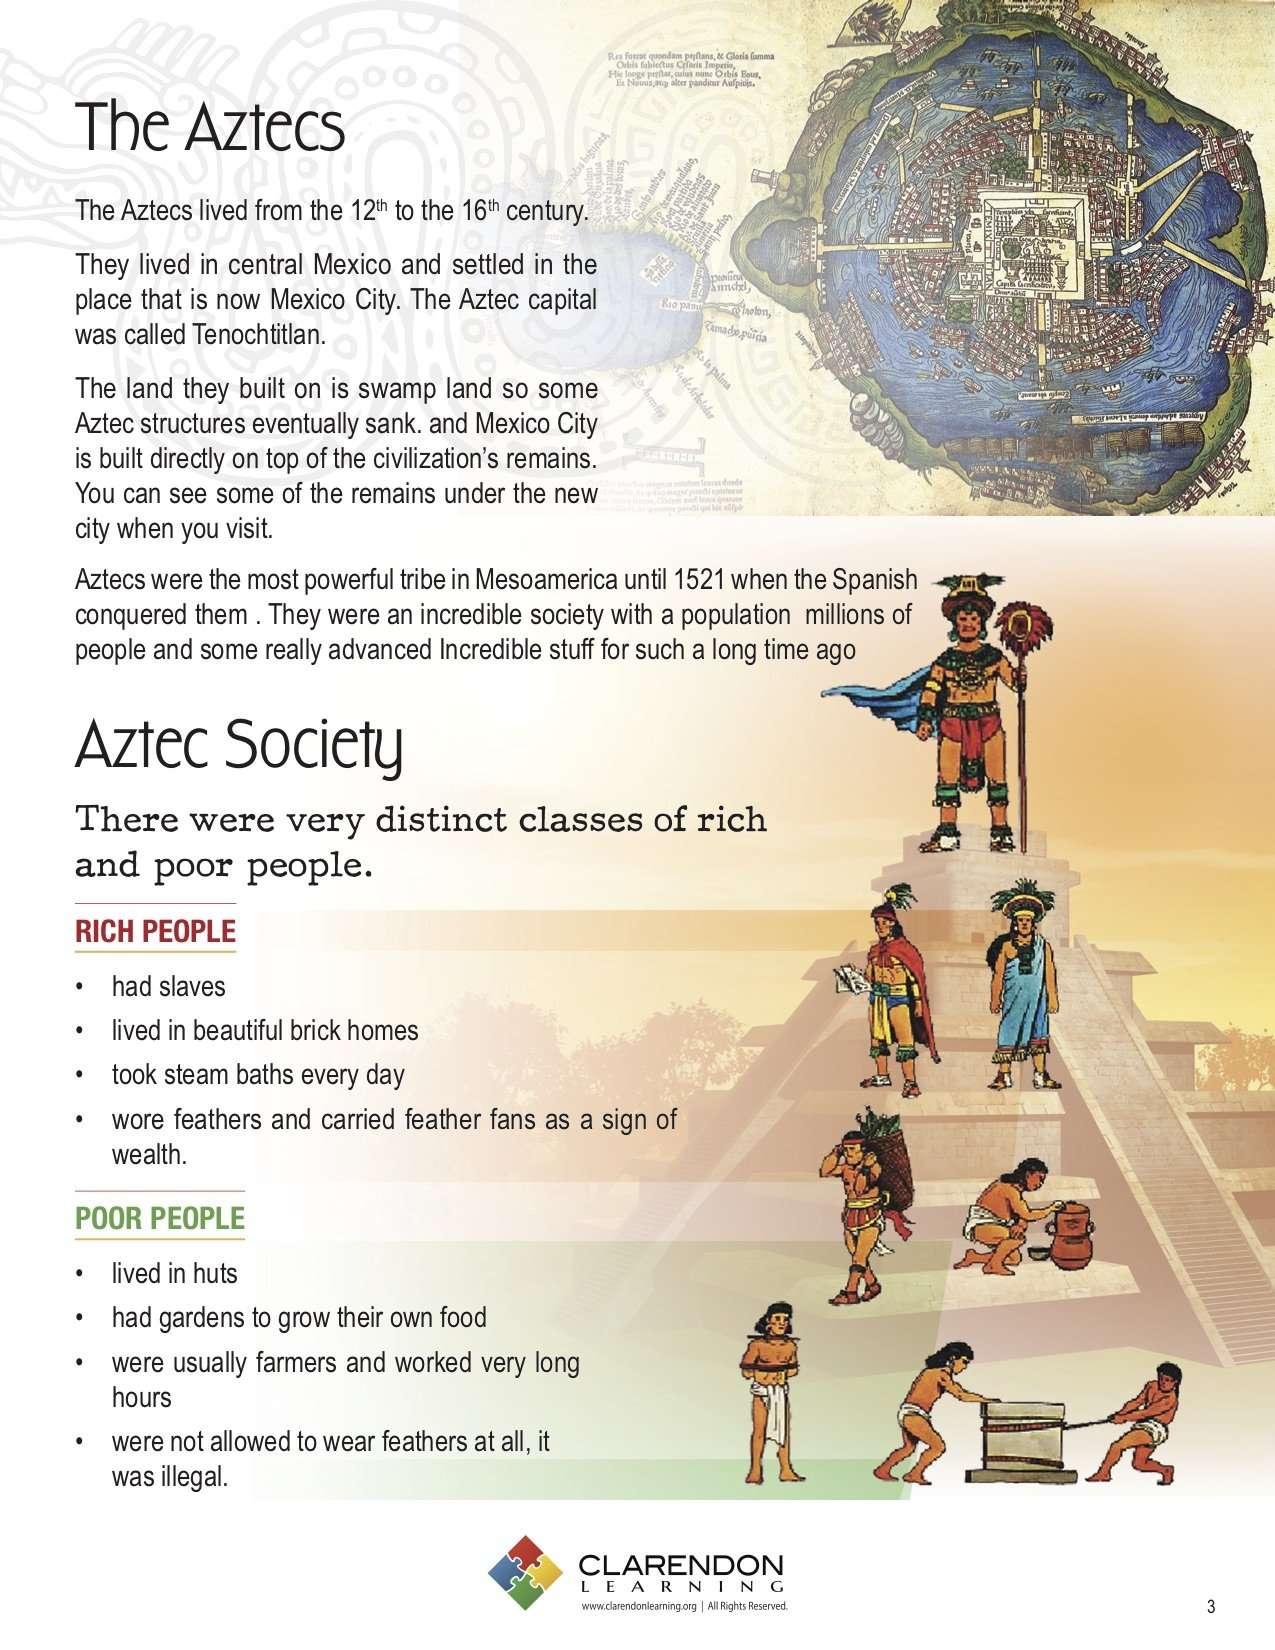 The Aztecs Lesson Plan Clarendon Learning